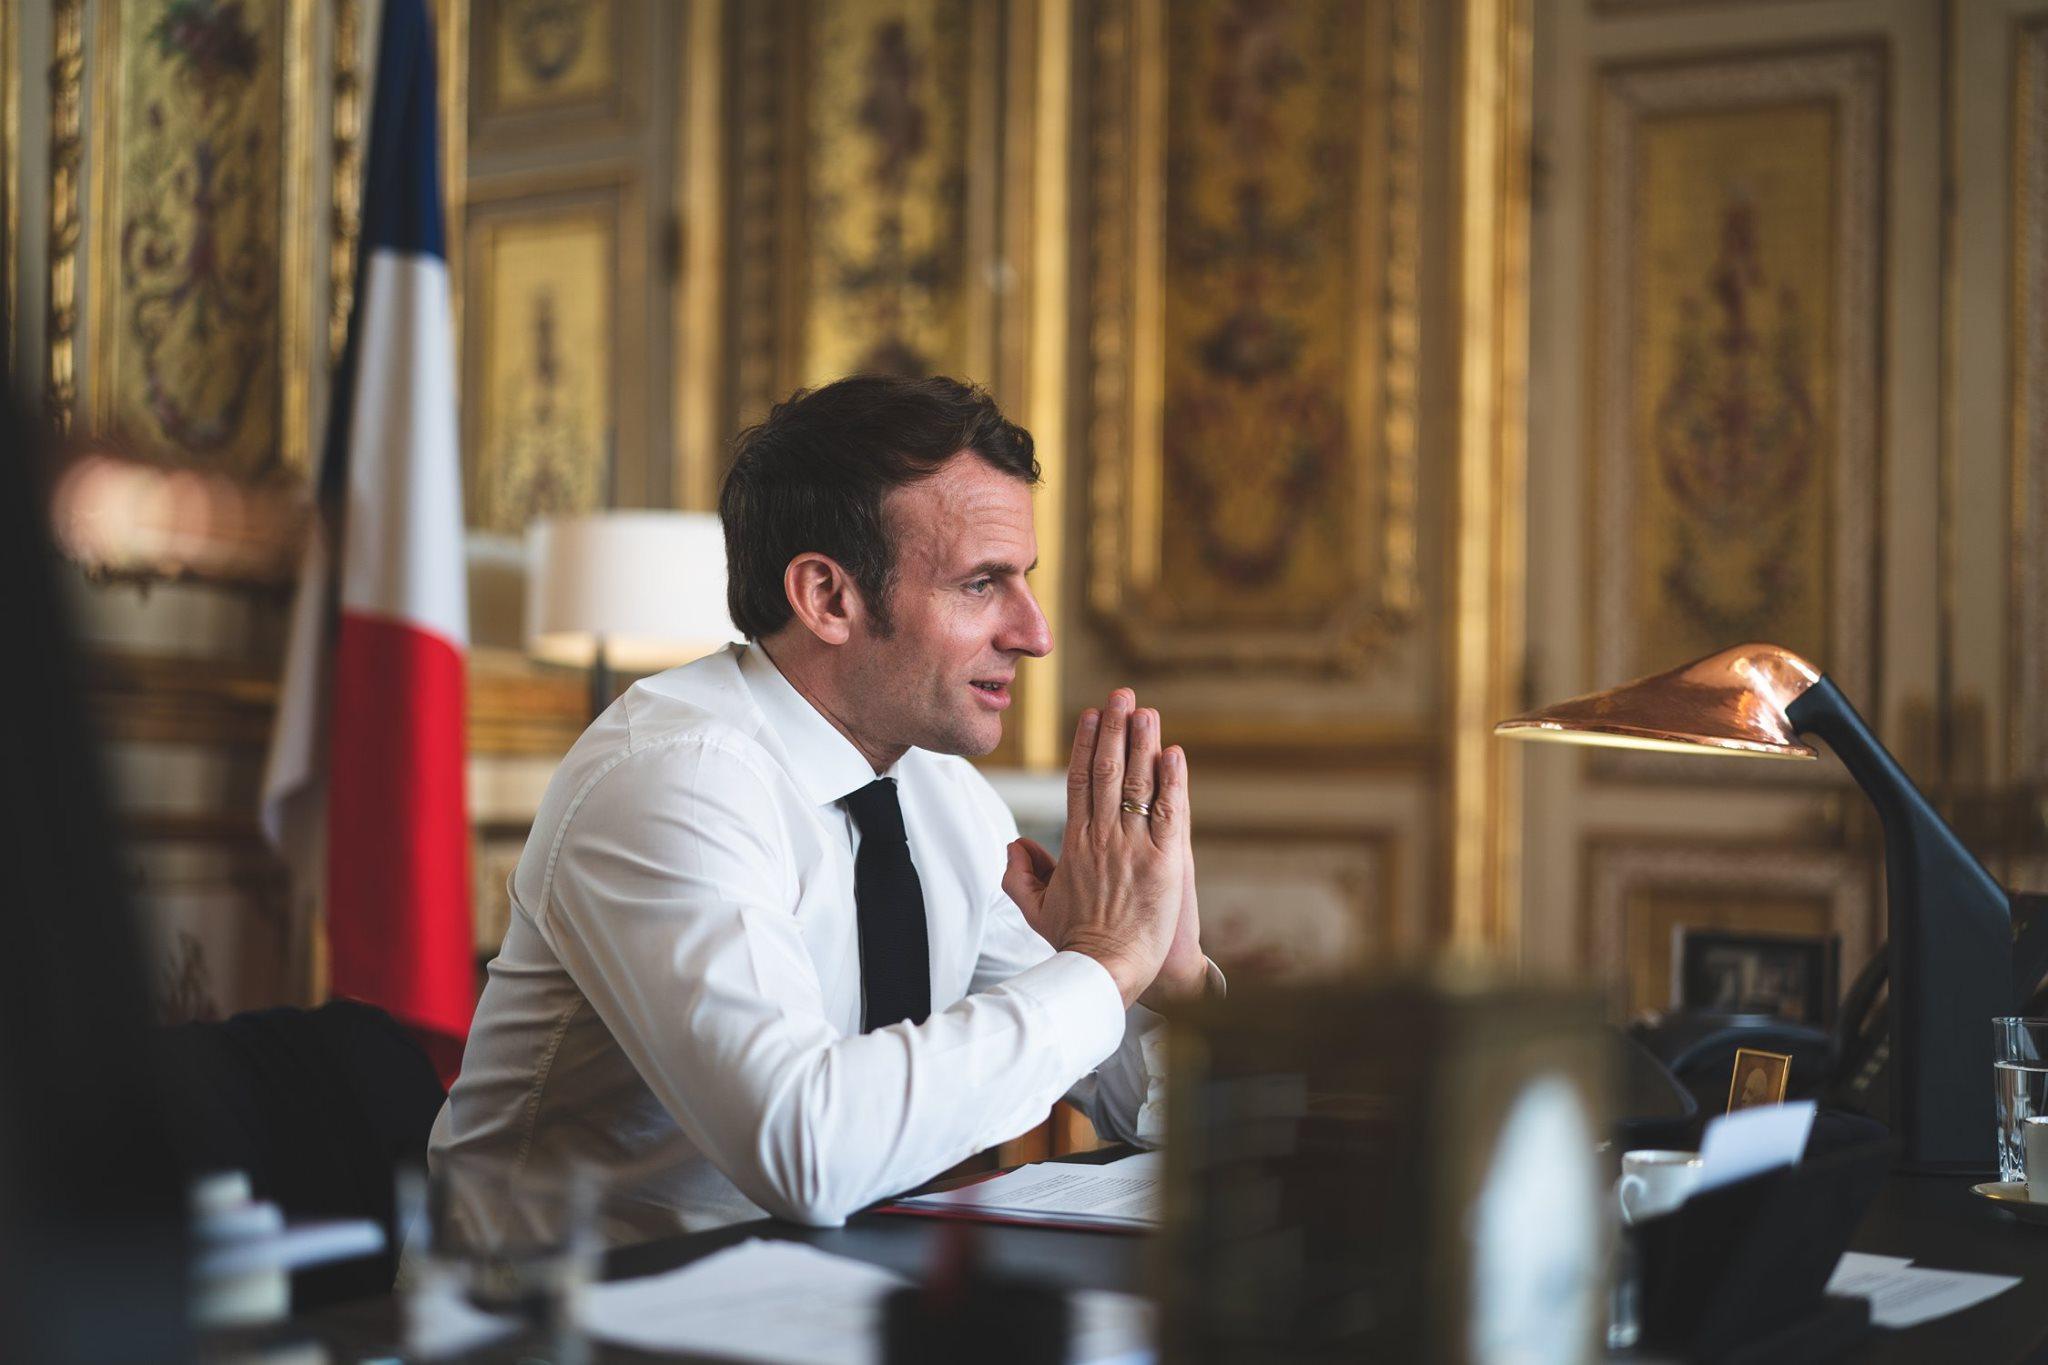 "<p>Фото © Facebook / <a href=""https://www.facebook.com/EmmanuelMacron/photos/a.1536815099884404/2715129432052959"" target=""_blank"" rel=""noopener noreferrer"">Emmanuel Macron</a></p>"